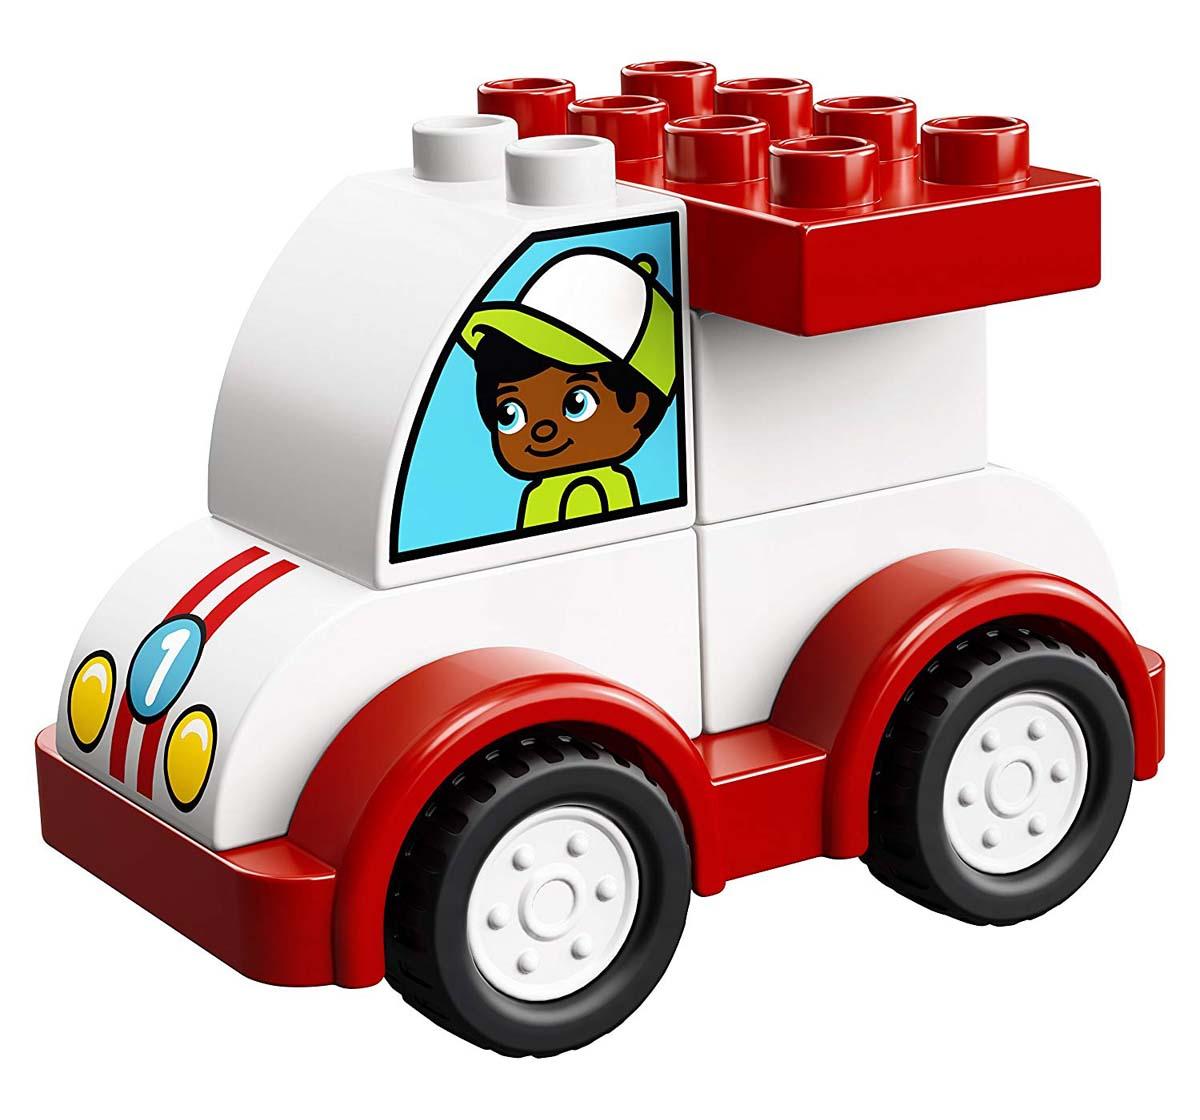 LEGO   Lego Duplo My First Race Car Building (6 Pcs) 10860 Blocks for Kids age 1½Y+